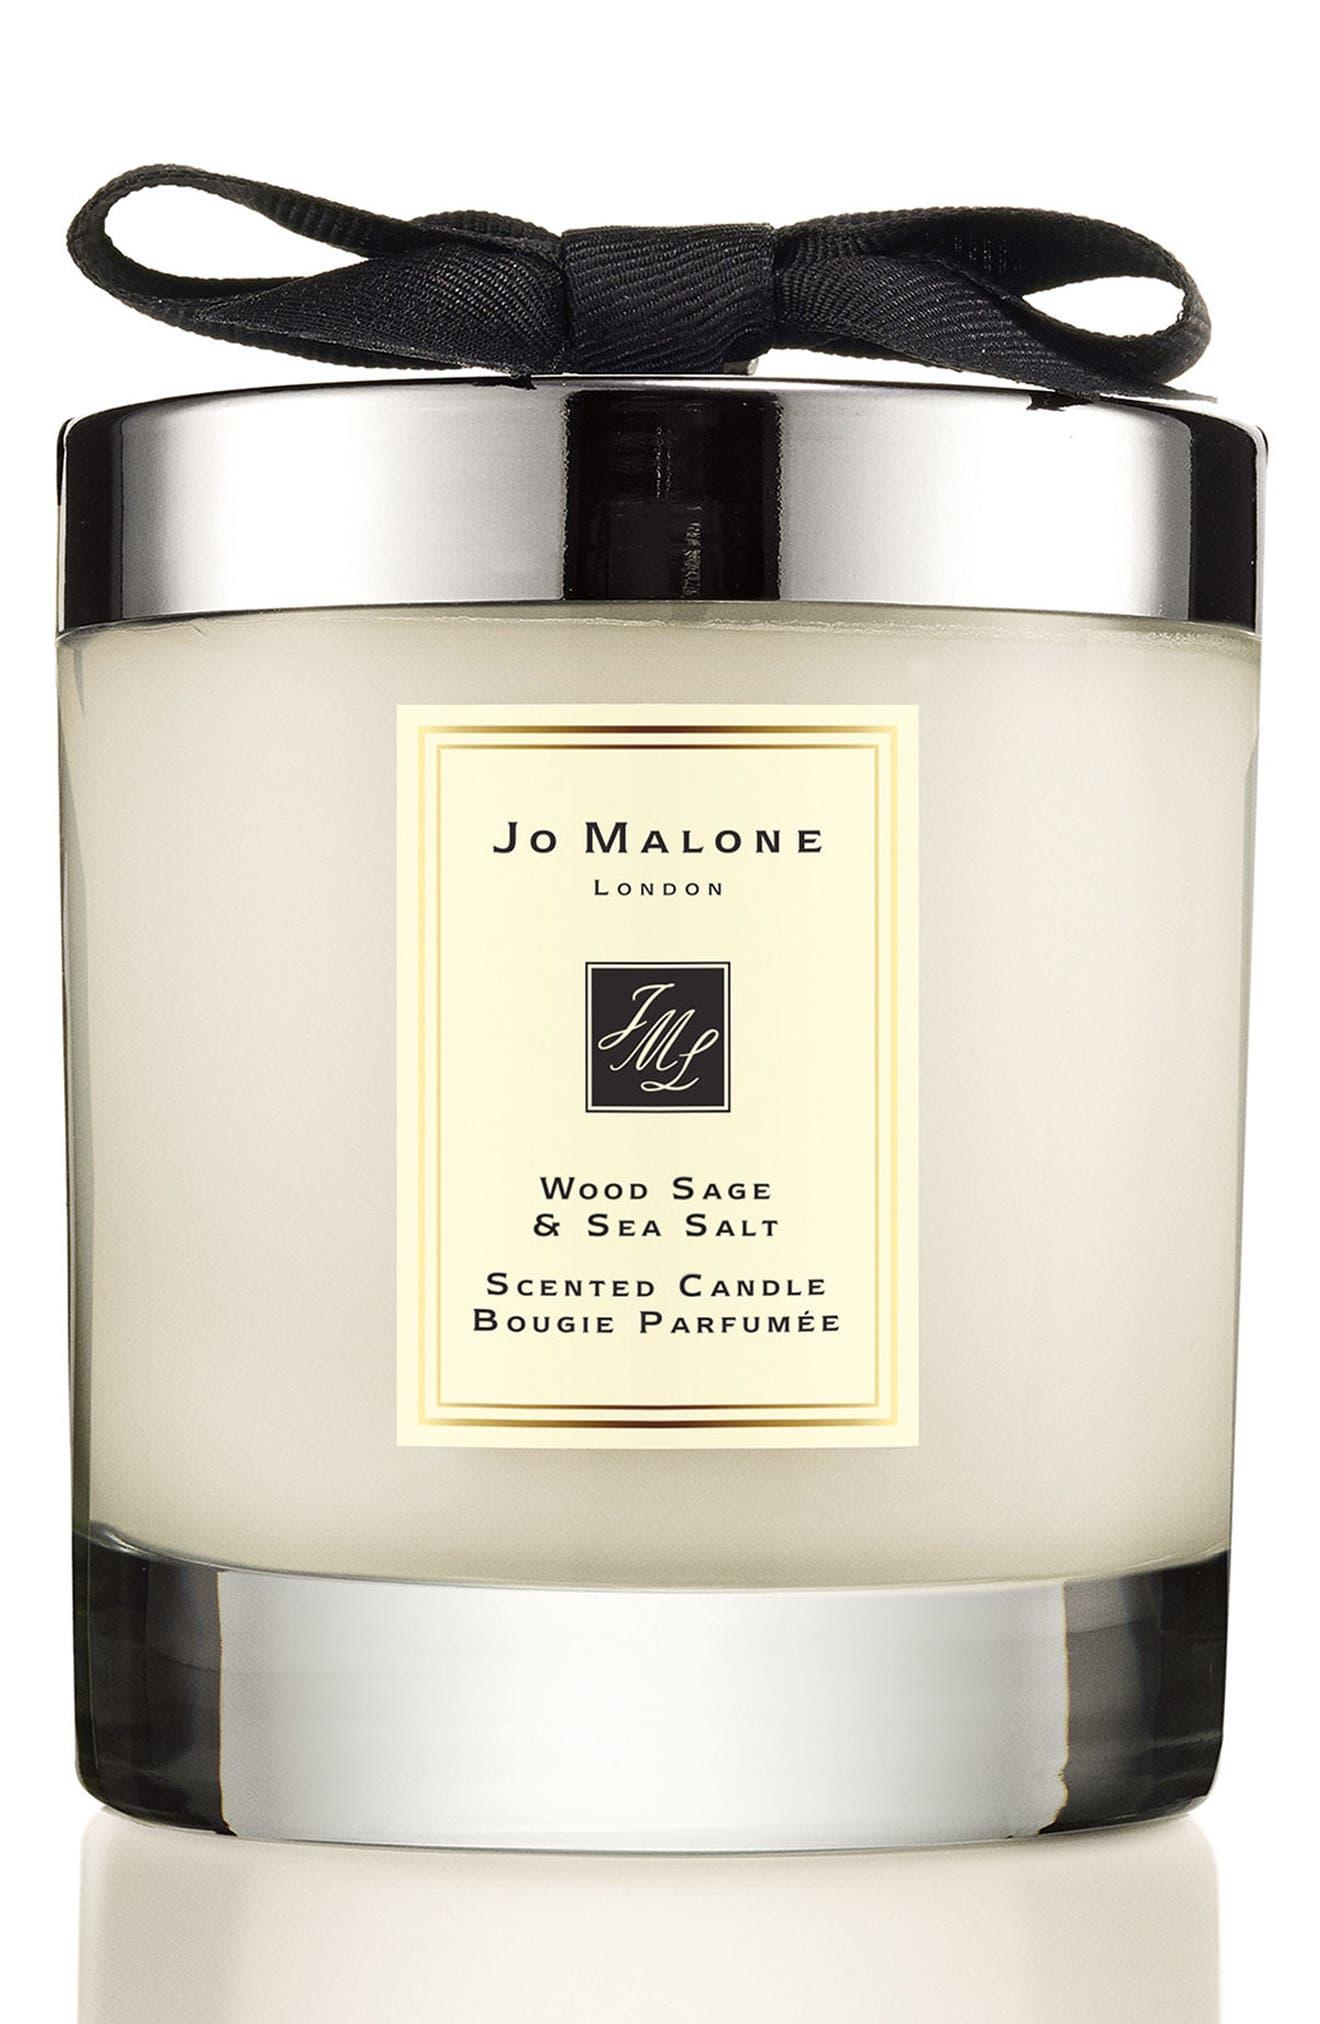 Jo Malone™ 'Wood Sage & Sea Salt' Candle